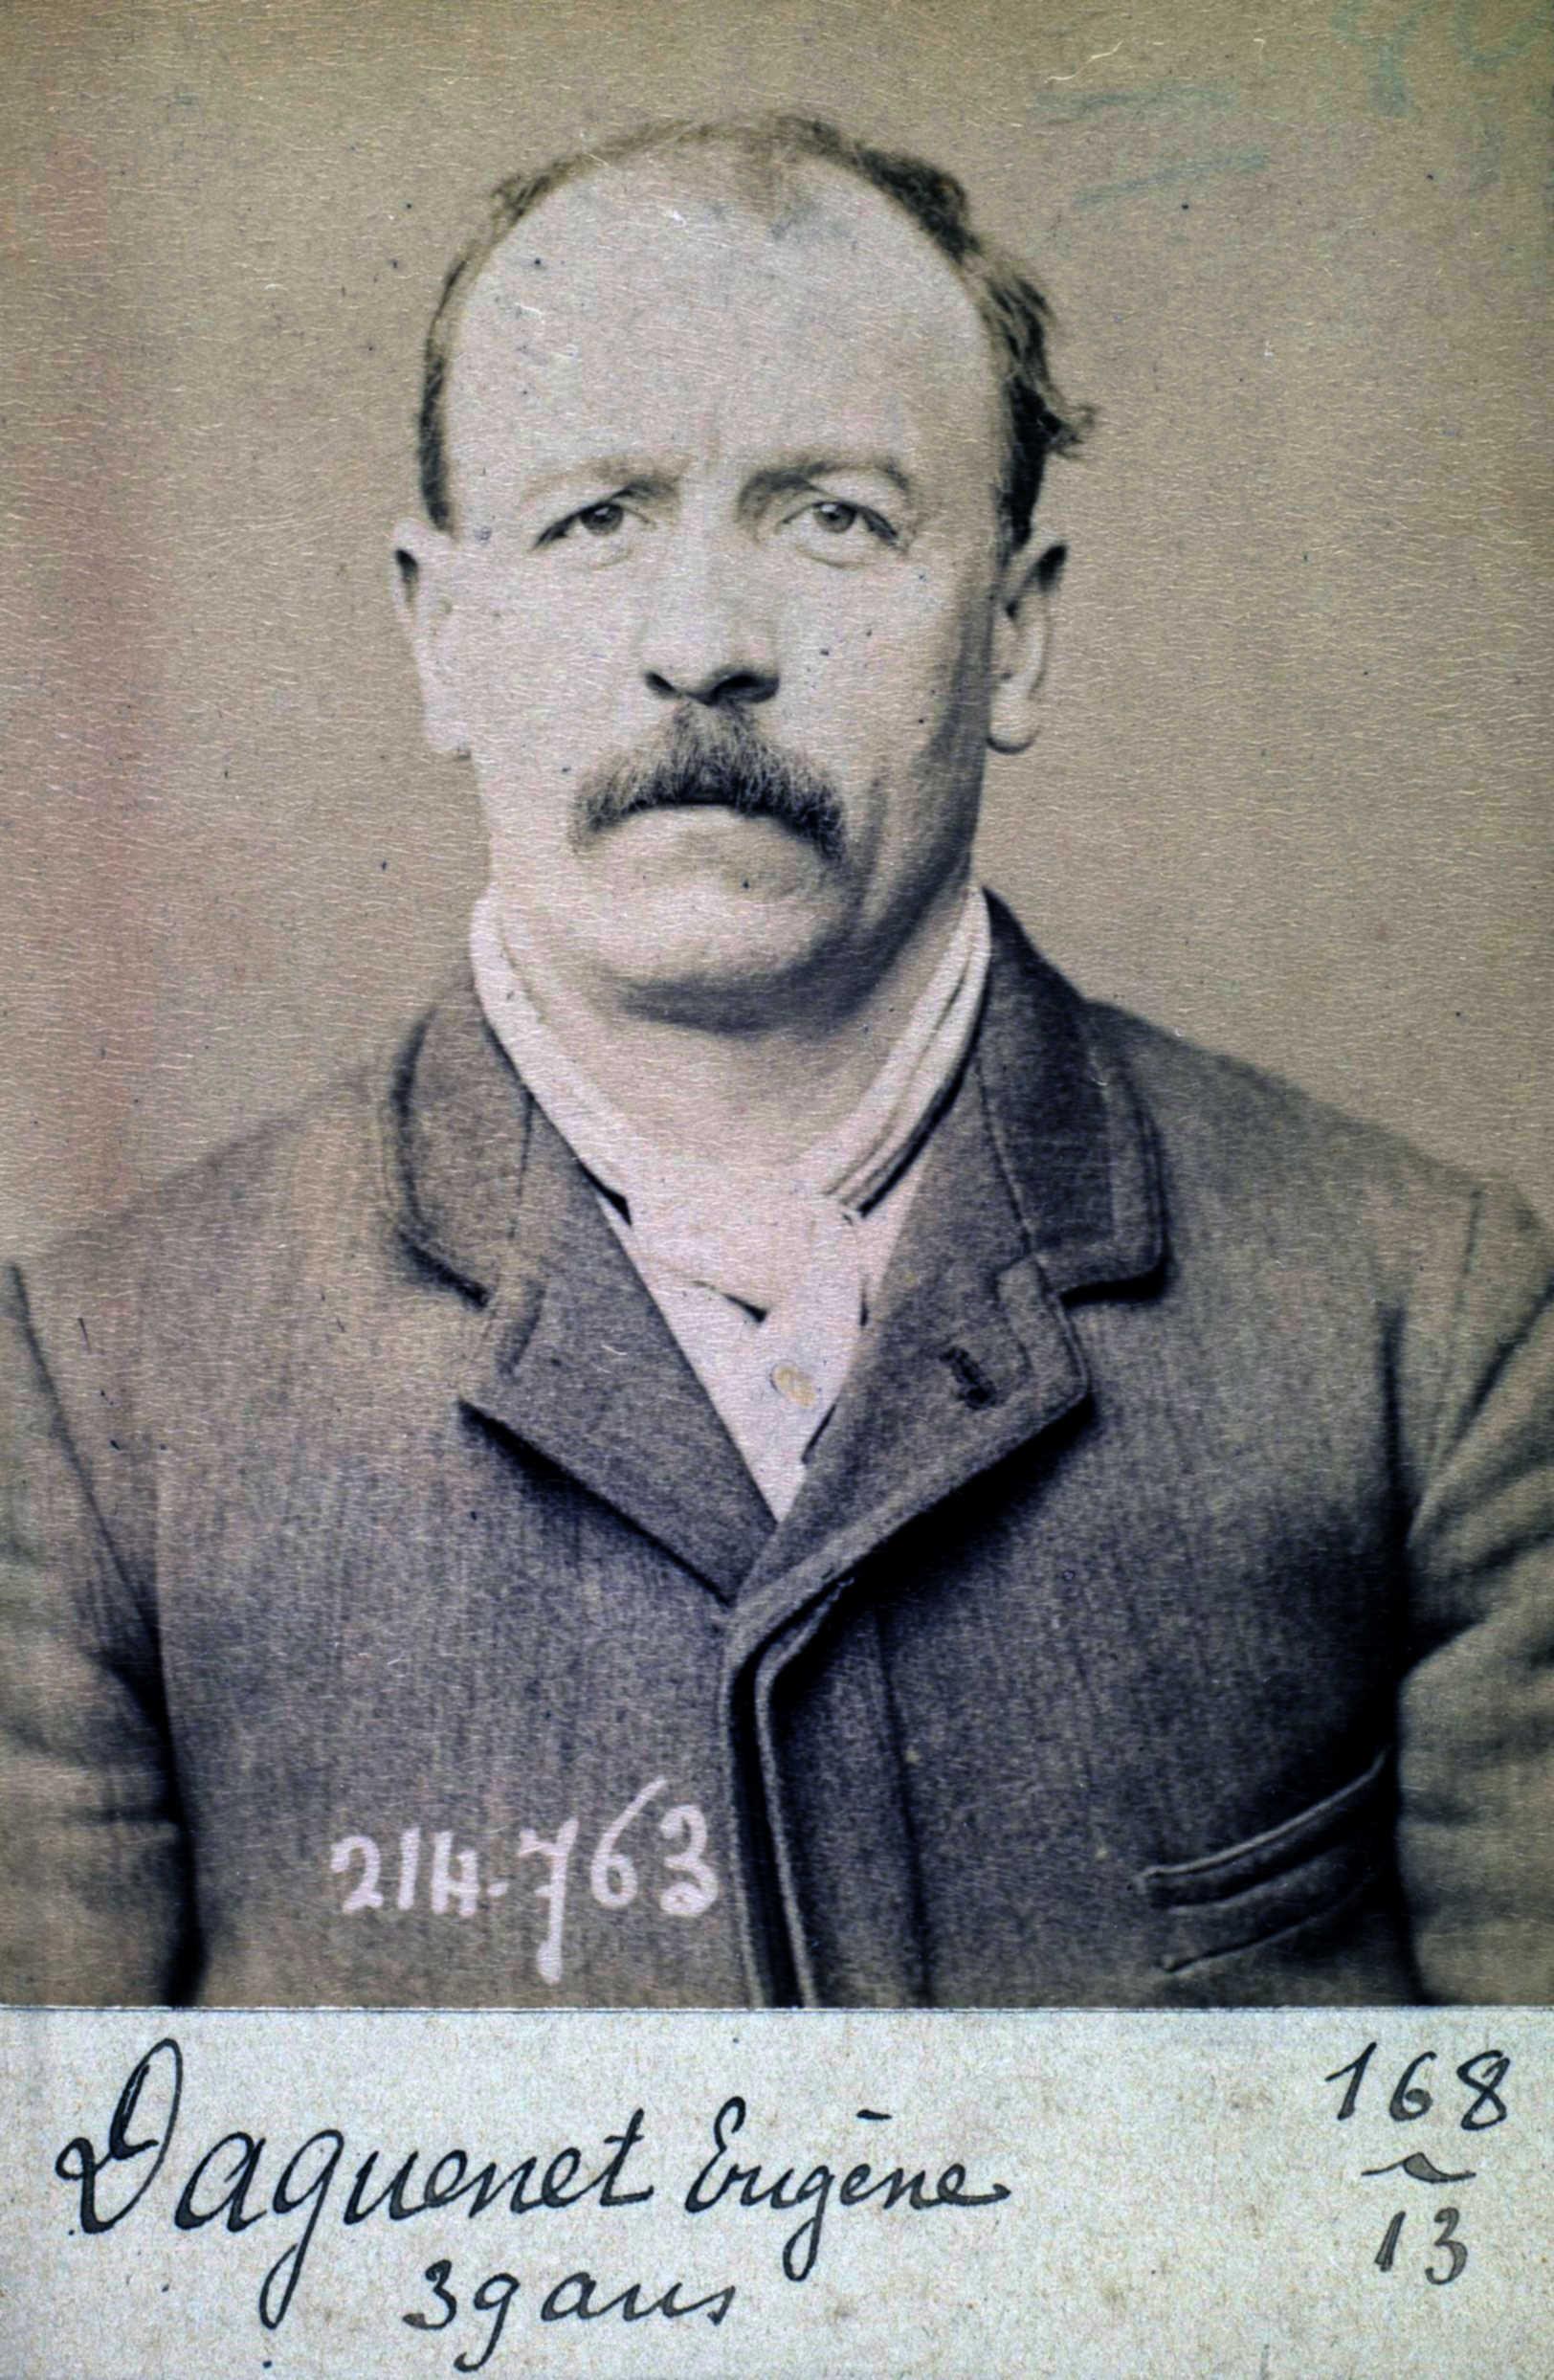 Fotografía policíaca d'Eugène Daguenet (26 de febrer de 1894)